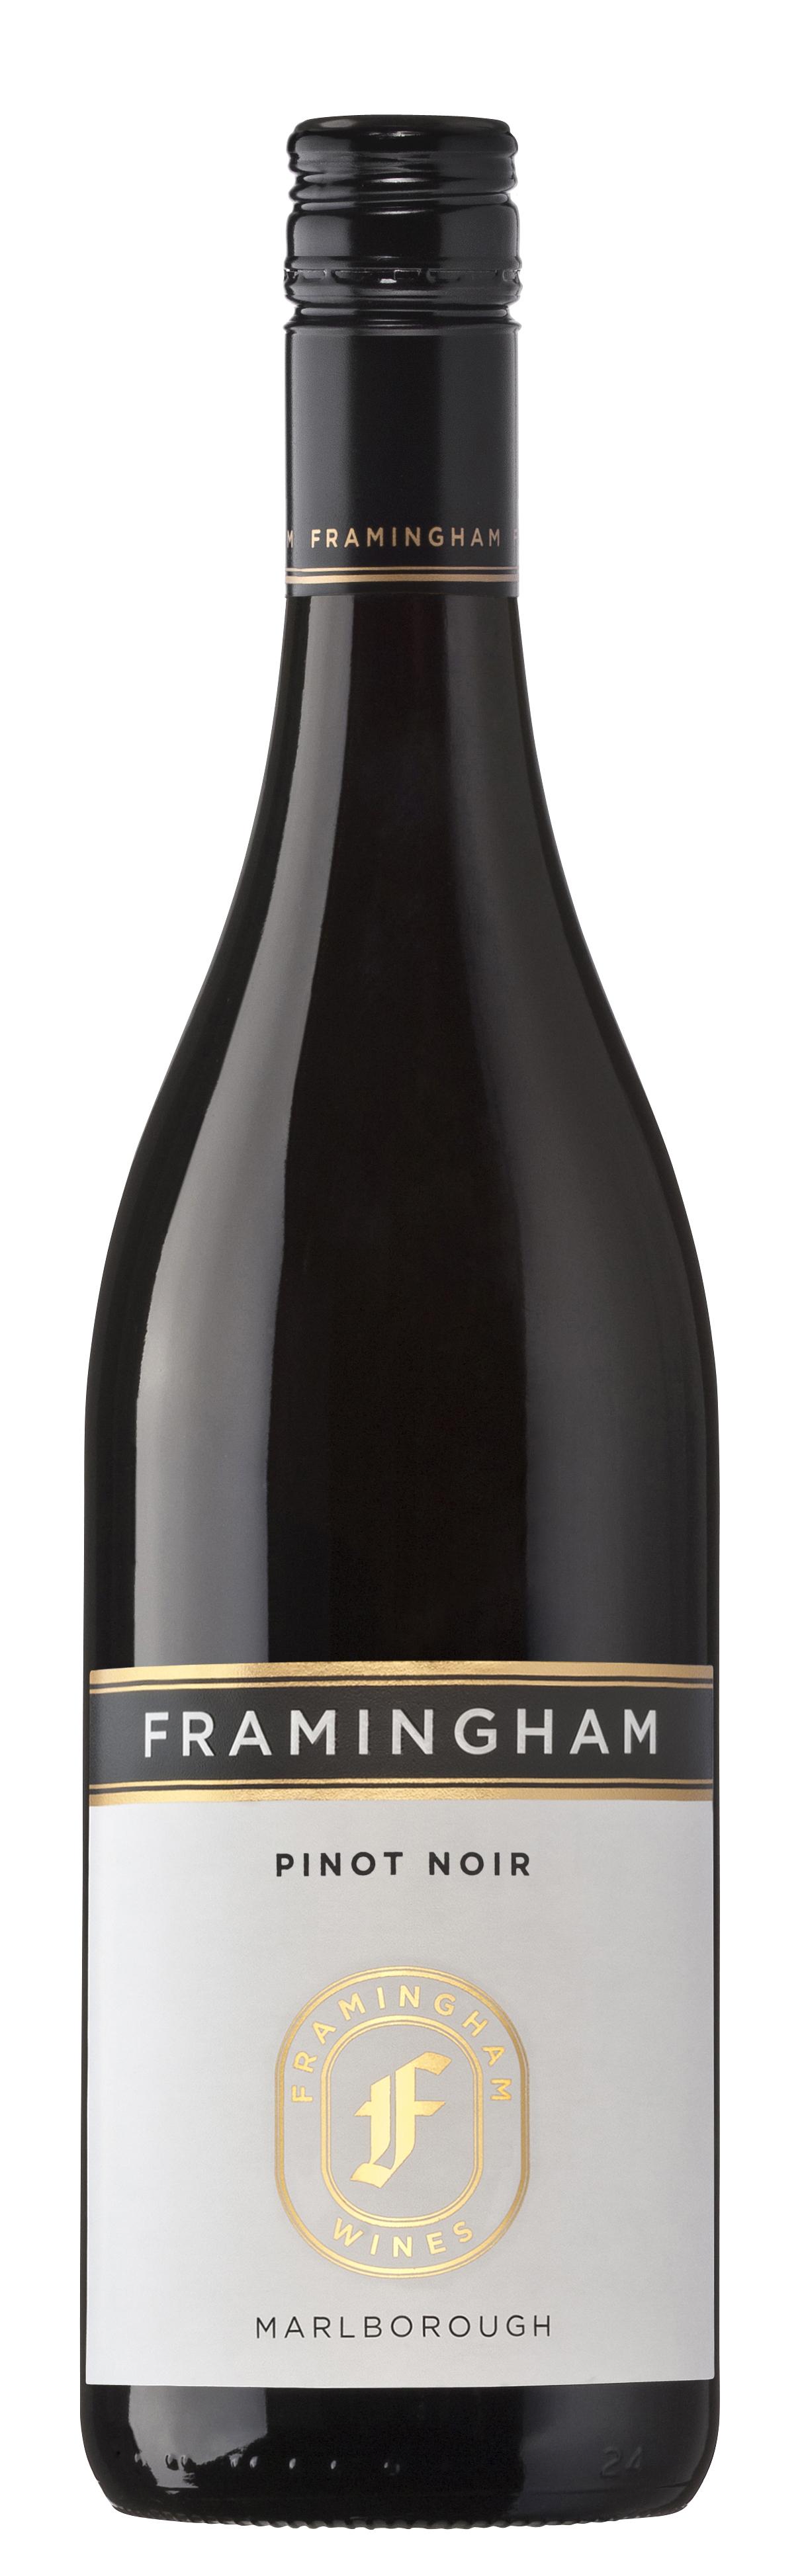 Framingham, Marlborough Pinot Noir 2015